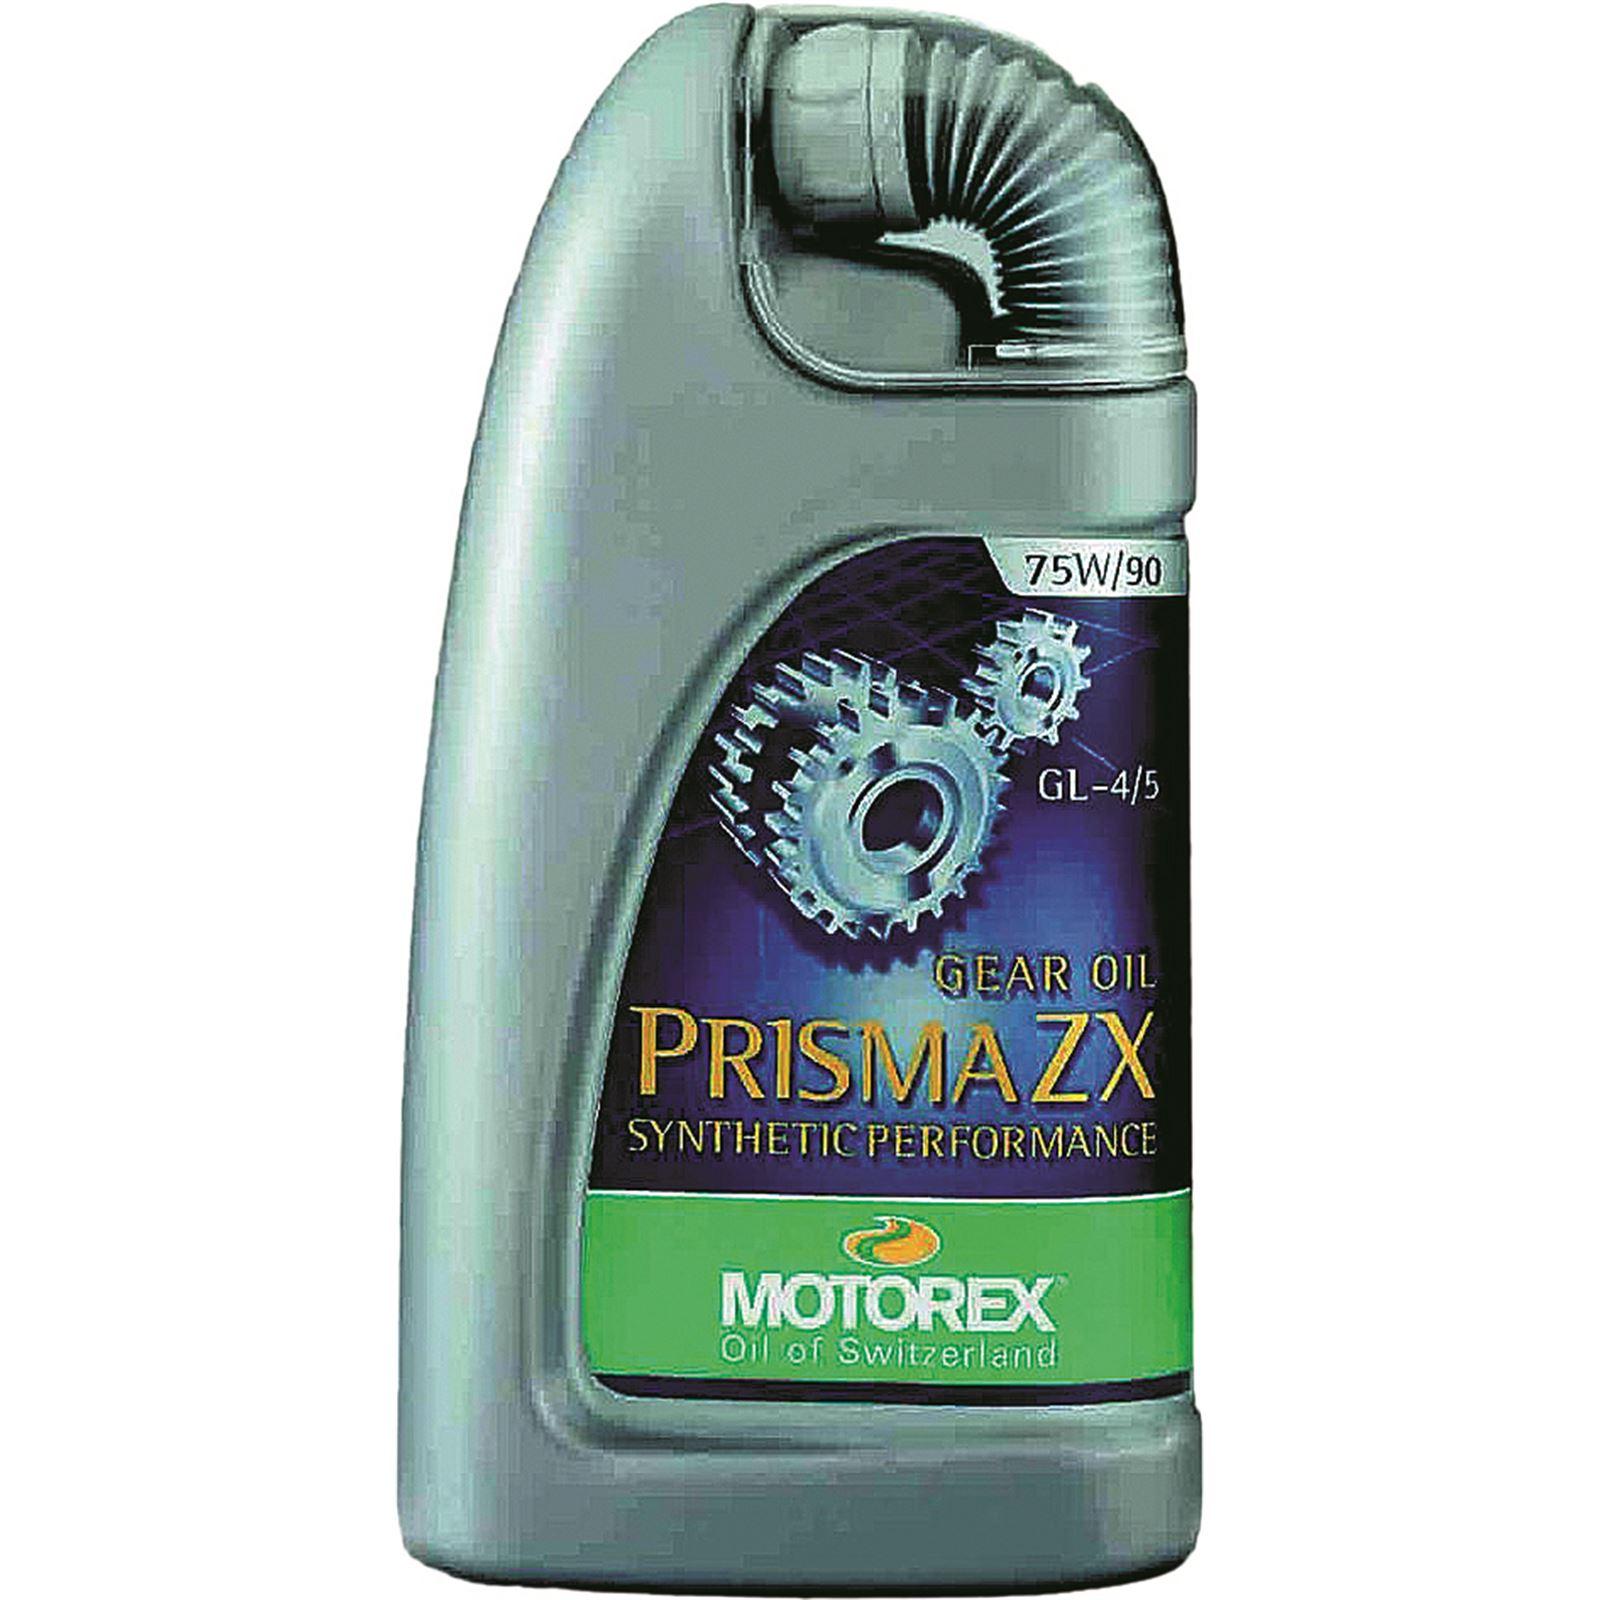 Motorex Prisma ZX Oil